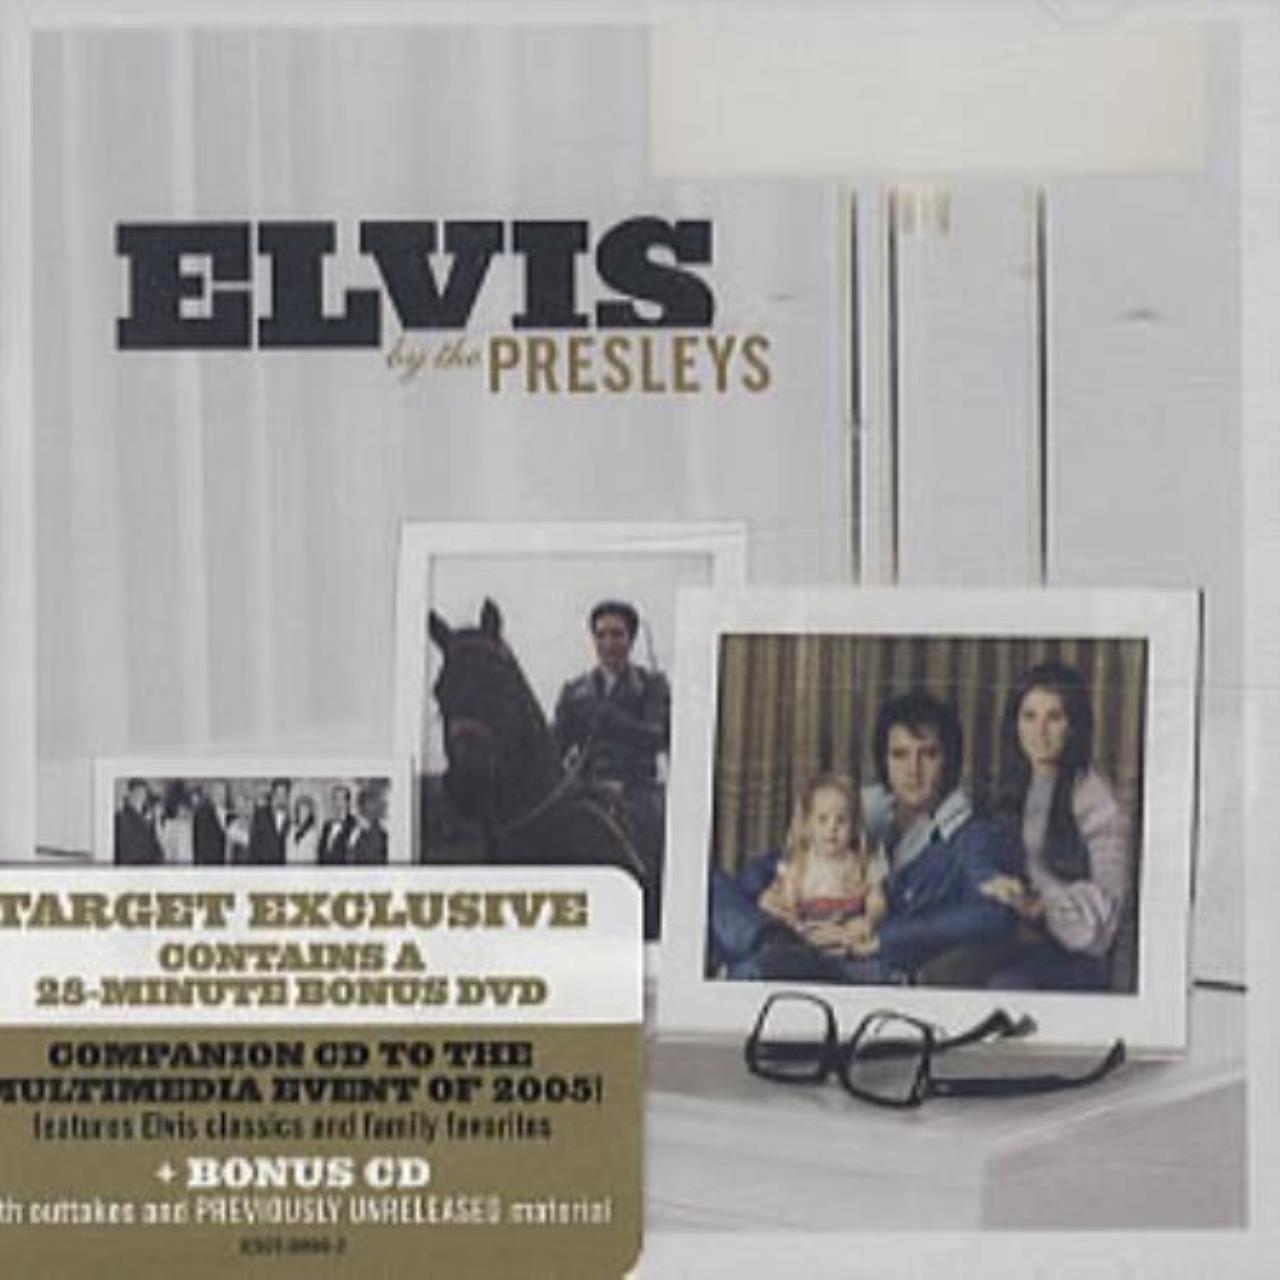 Elvis Presley Elvis By The Presleys [w Bonus DVD] Amazon Music